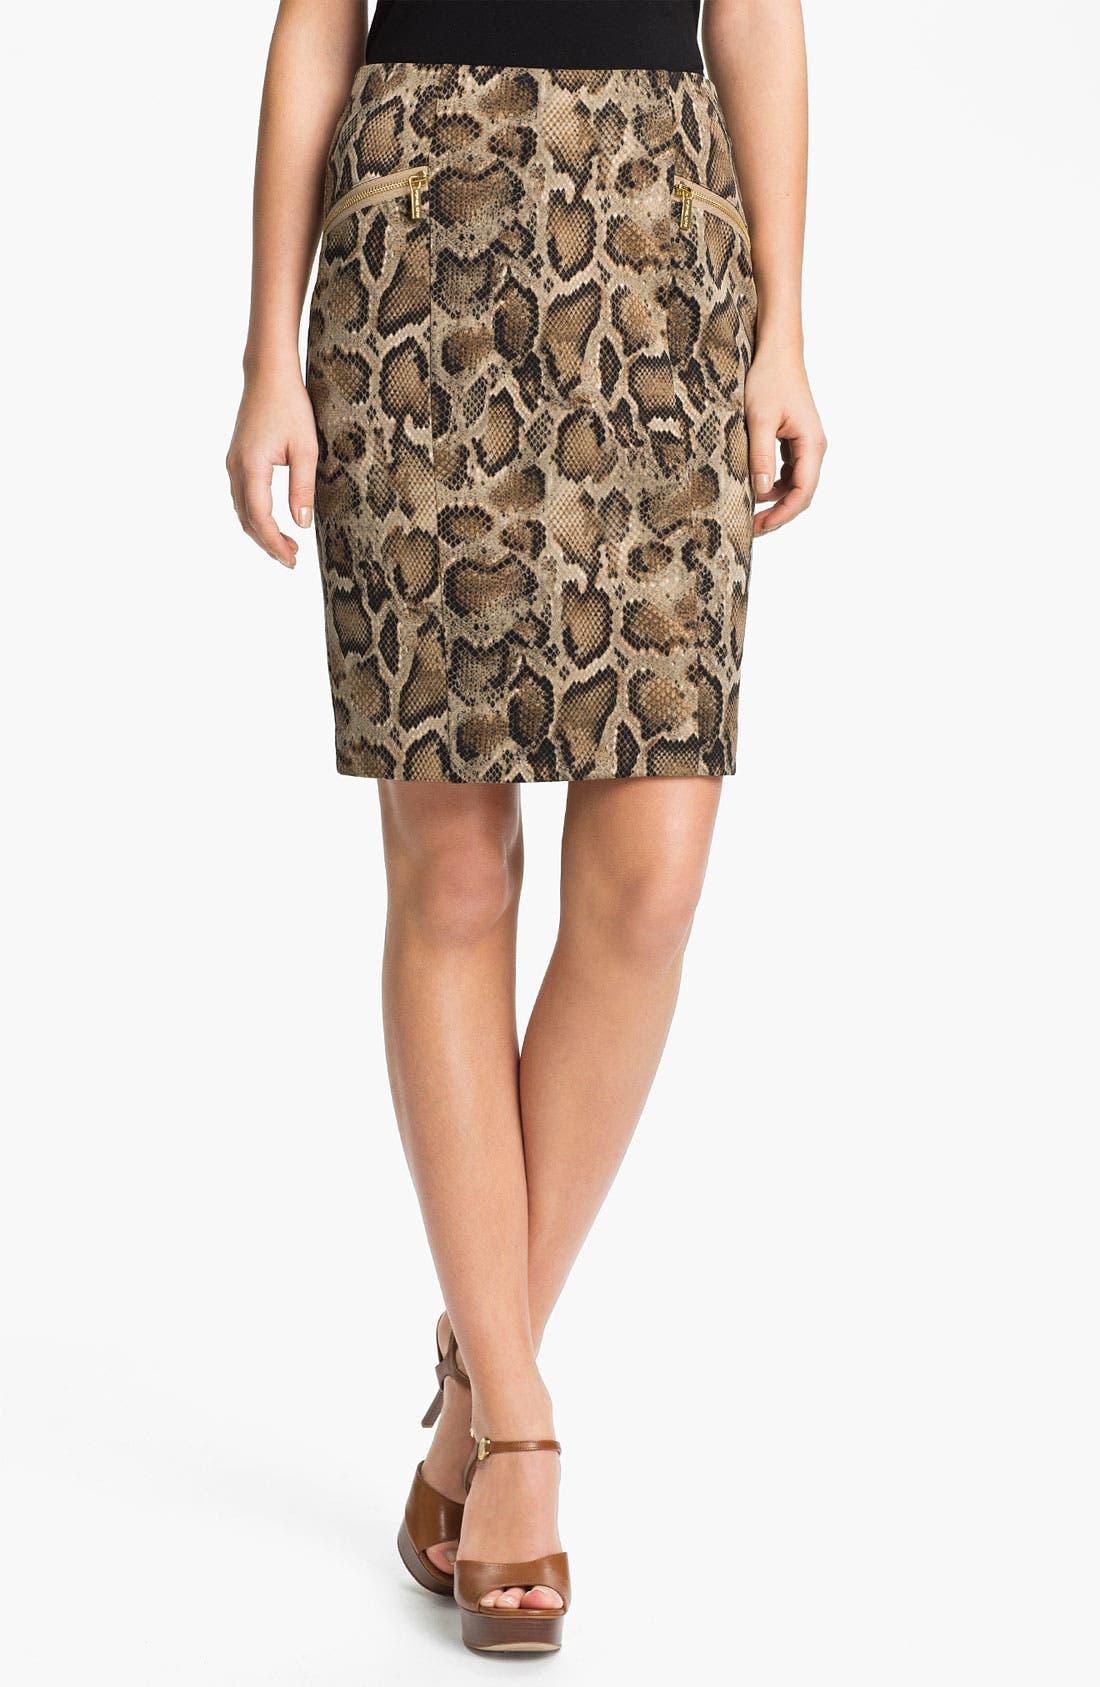 Alternate Image 1 Selected - MICHAEL Michael Kors 'Mamba' Snake Print Pencil Skirt